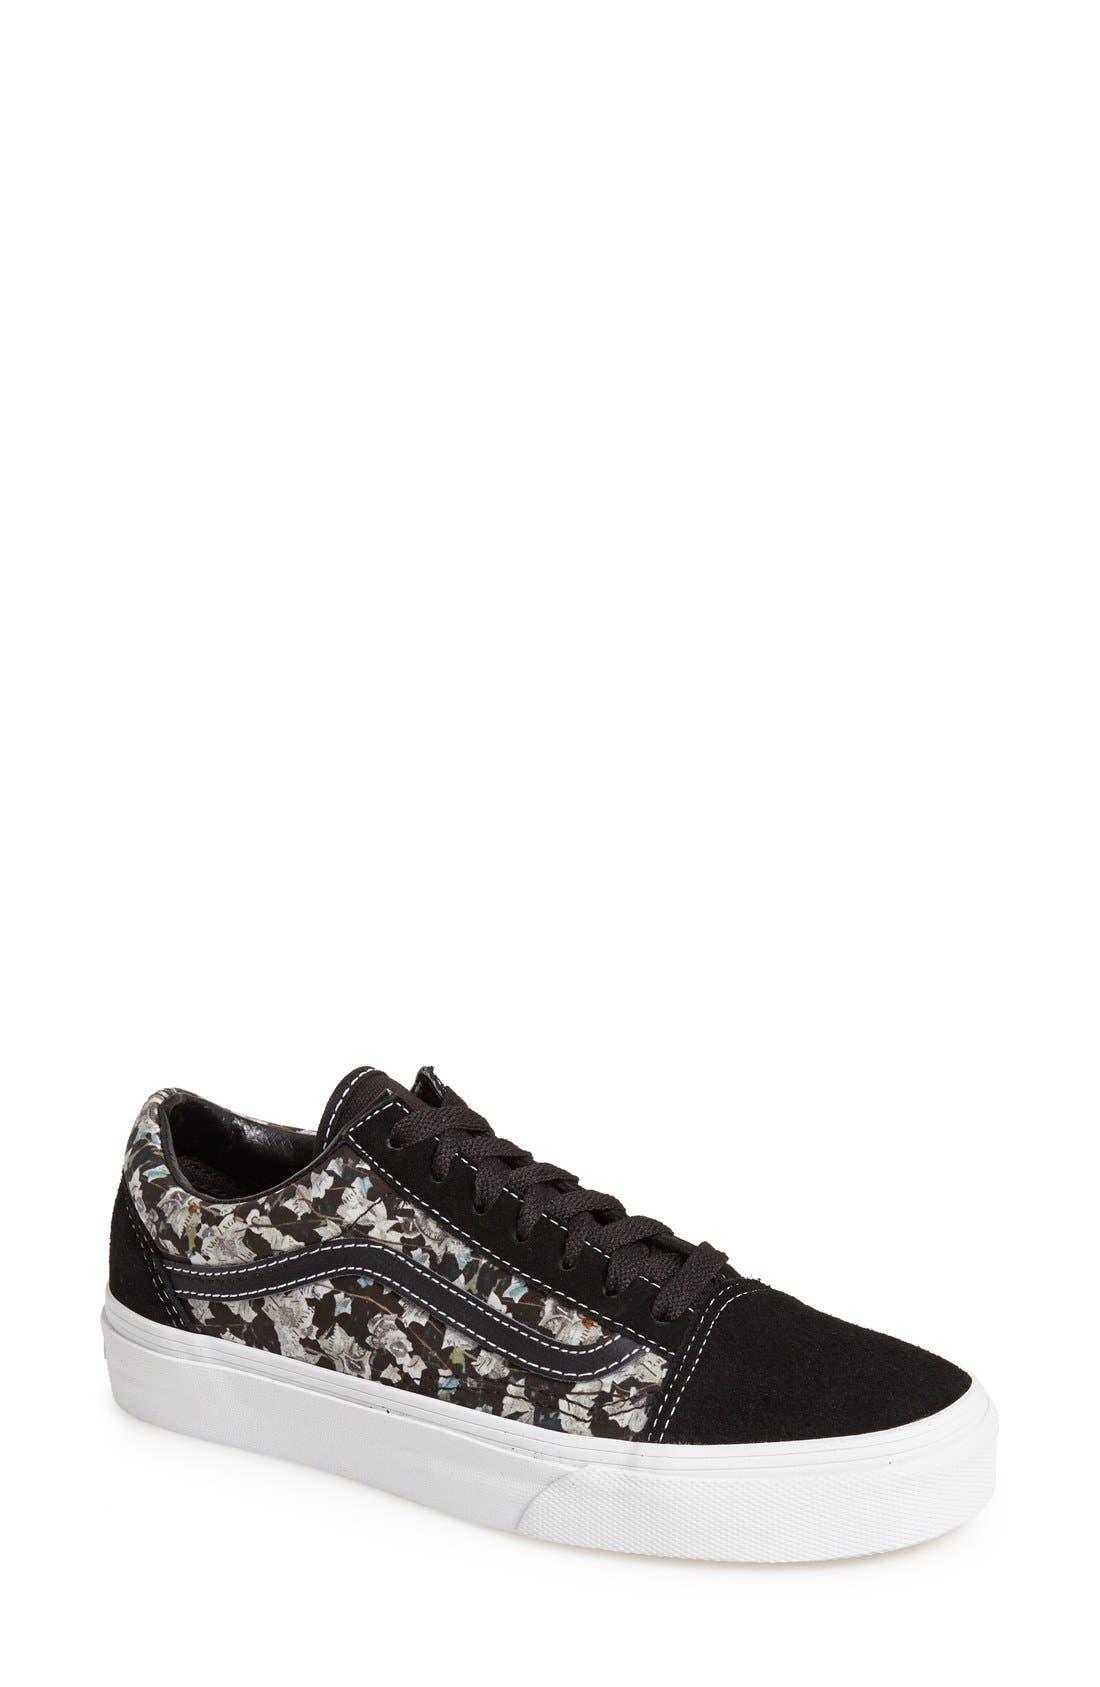 Main Image - Vans 'Old Skool - Liberty Era' Sneaker (Women)